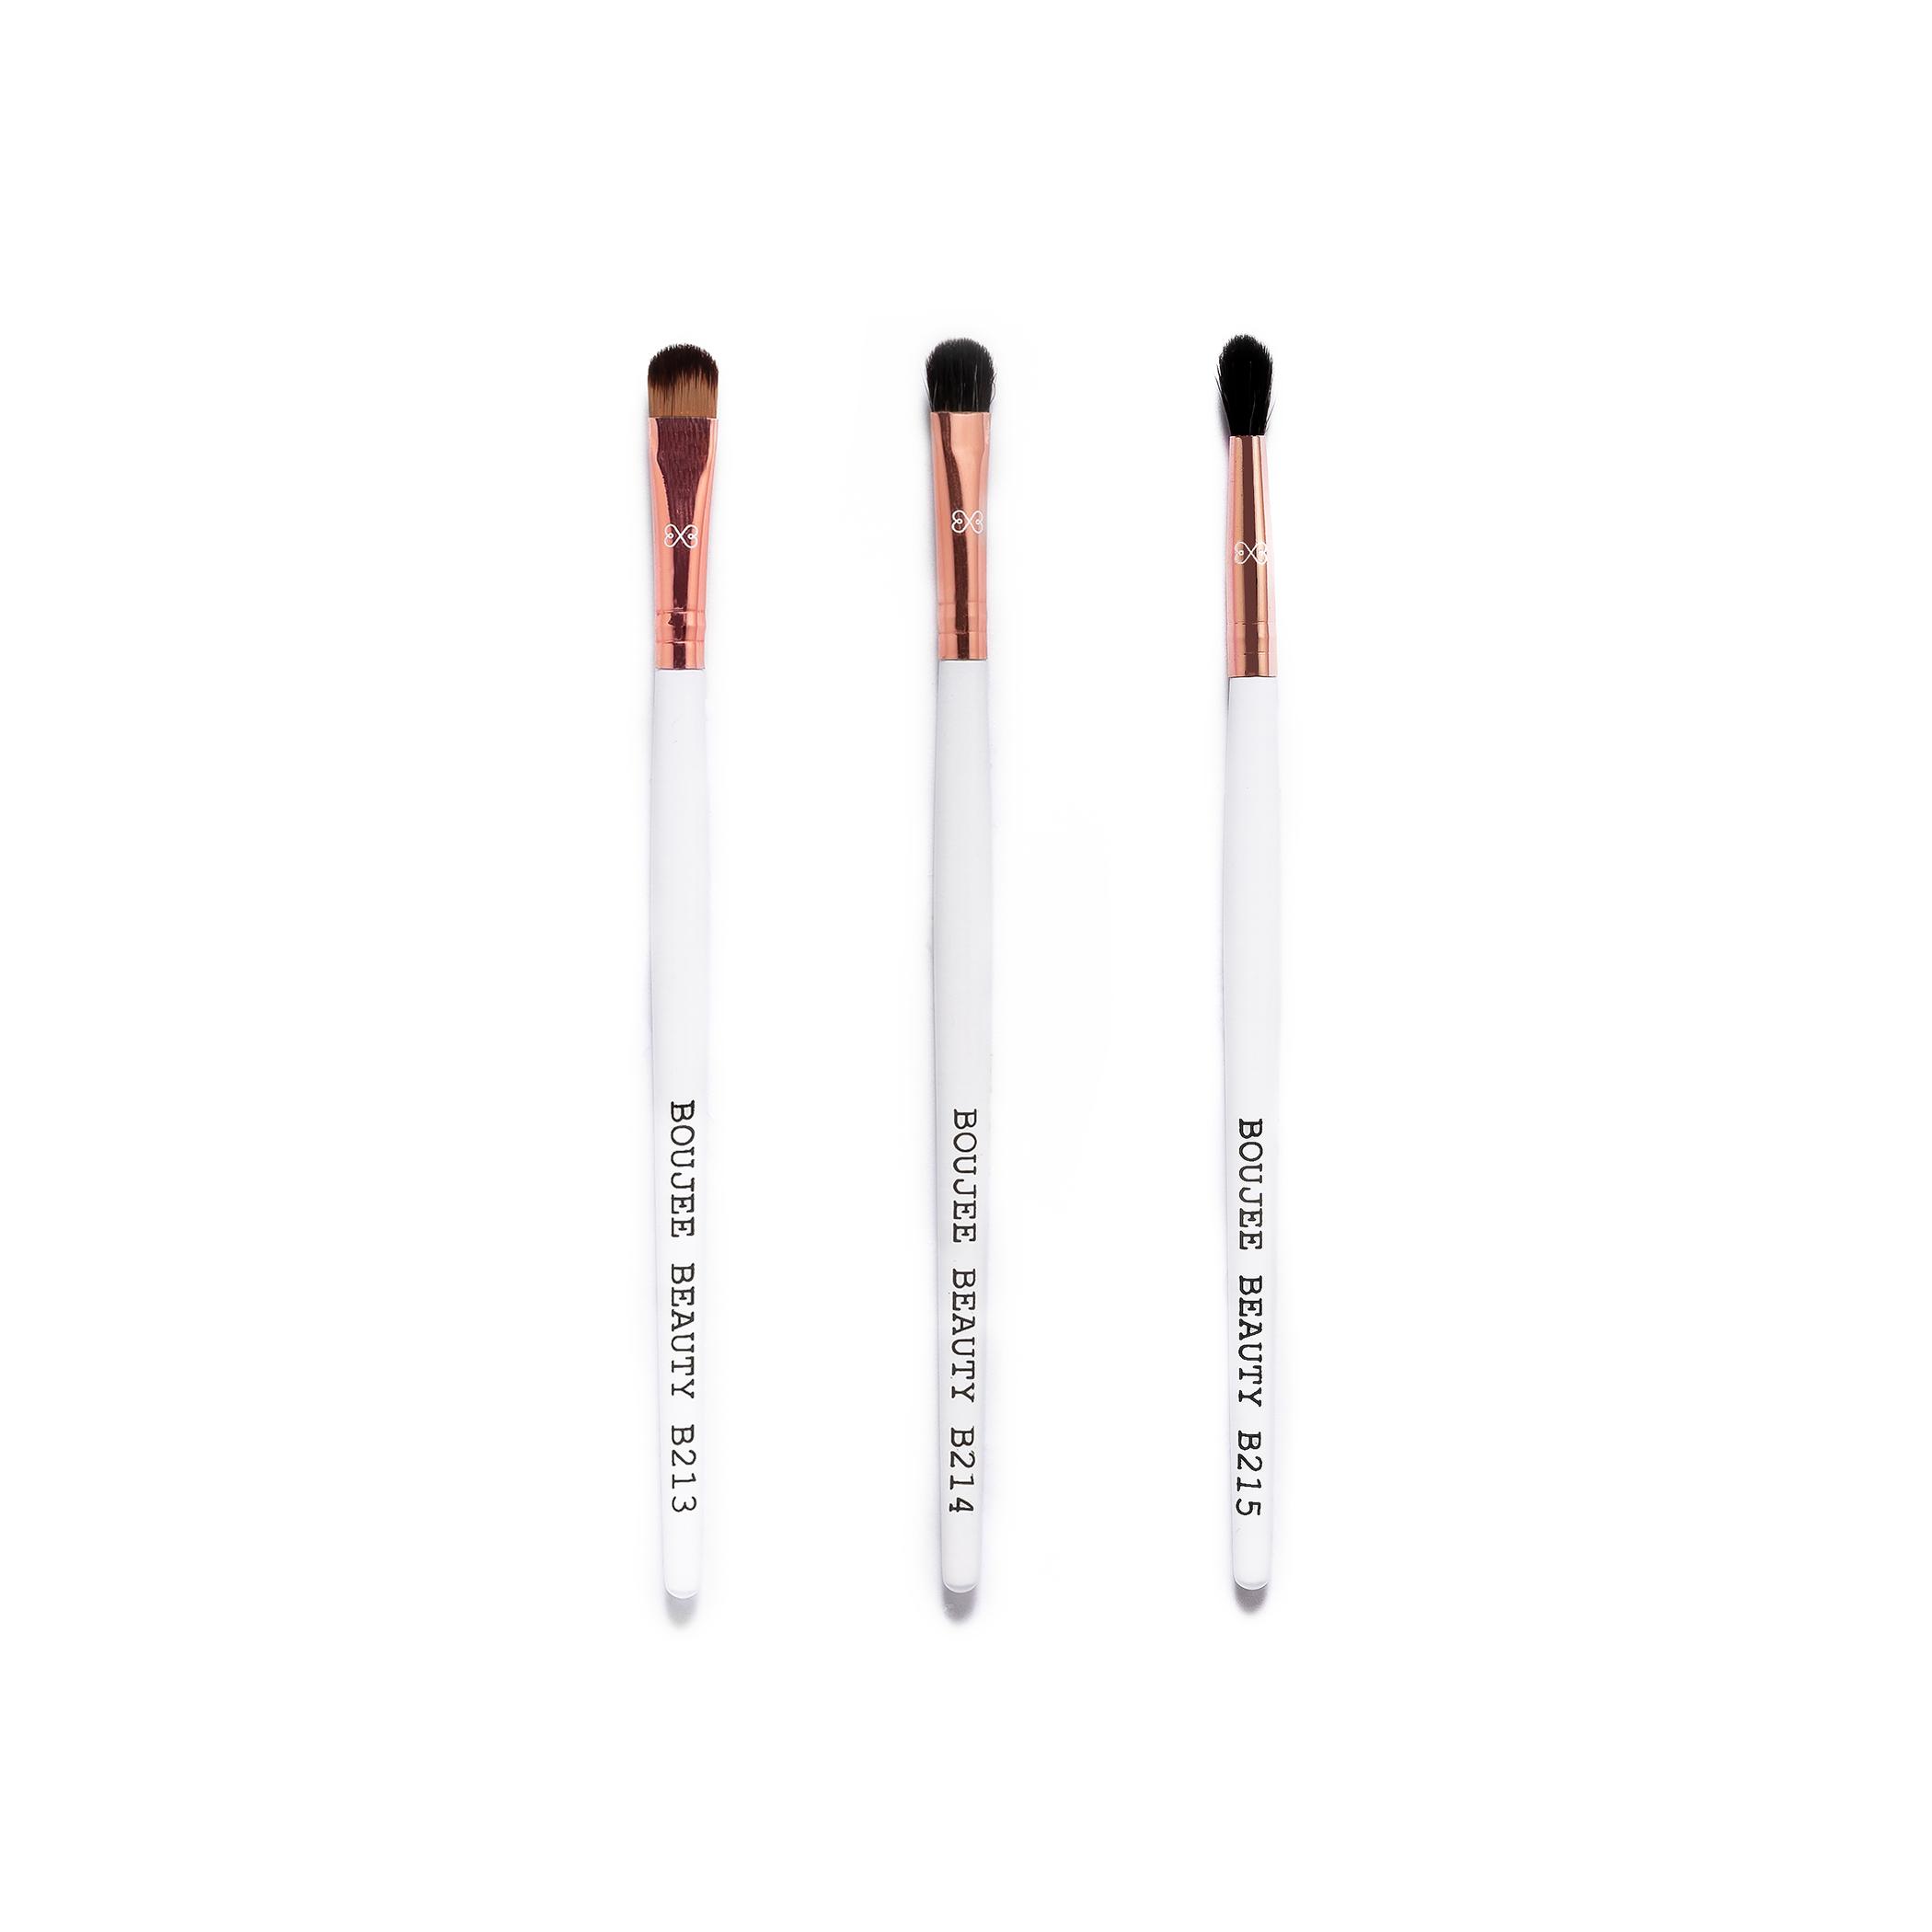 Boujee Beauty 3pcs. Precision Eye Brush Bundle